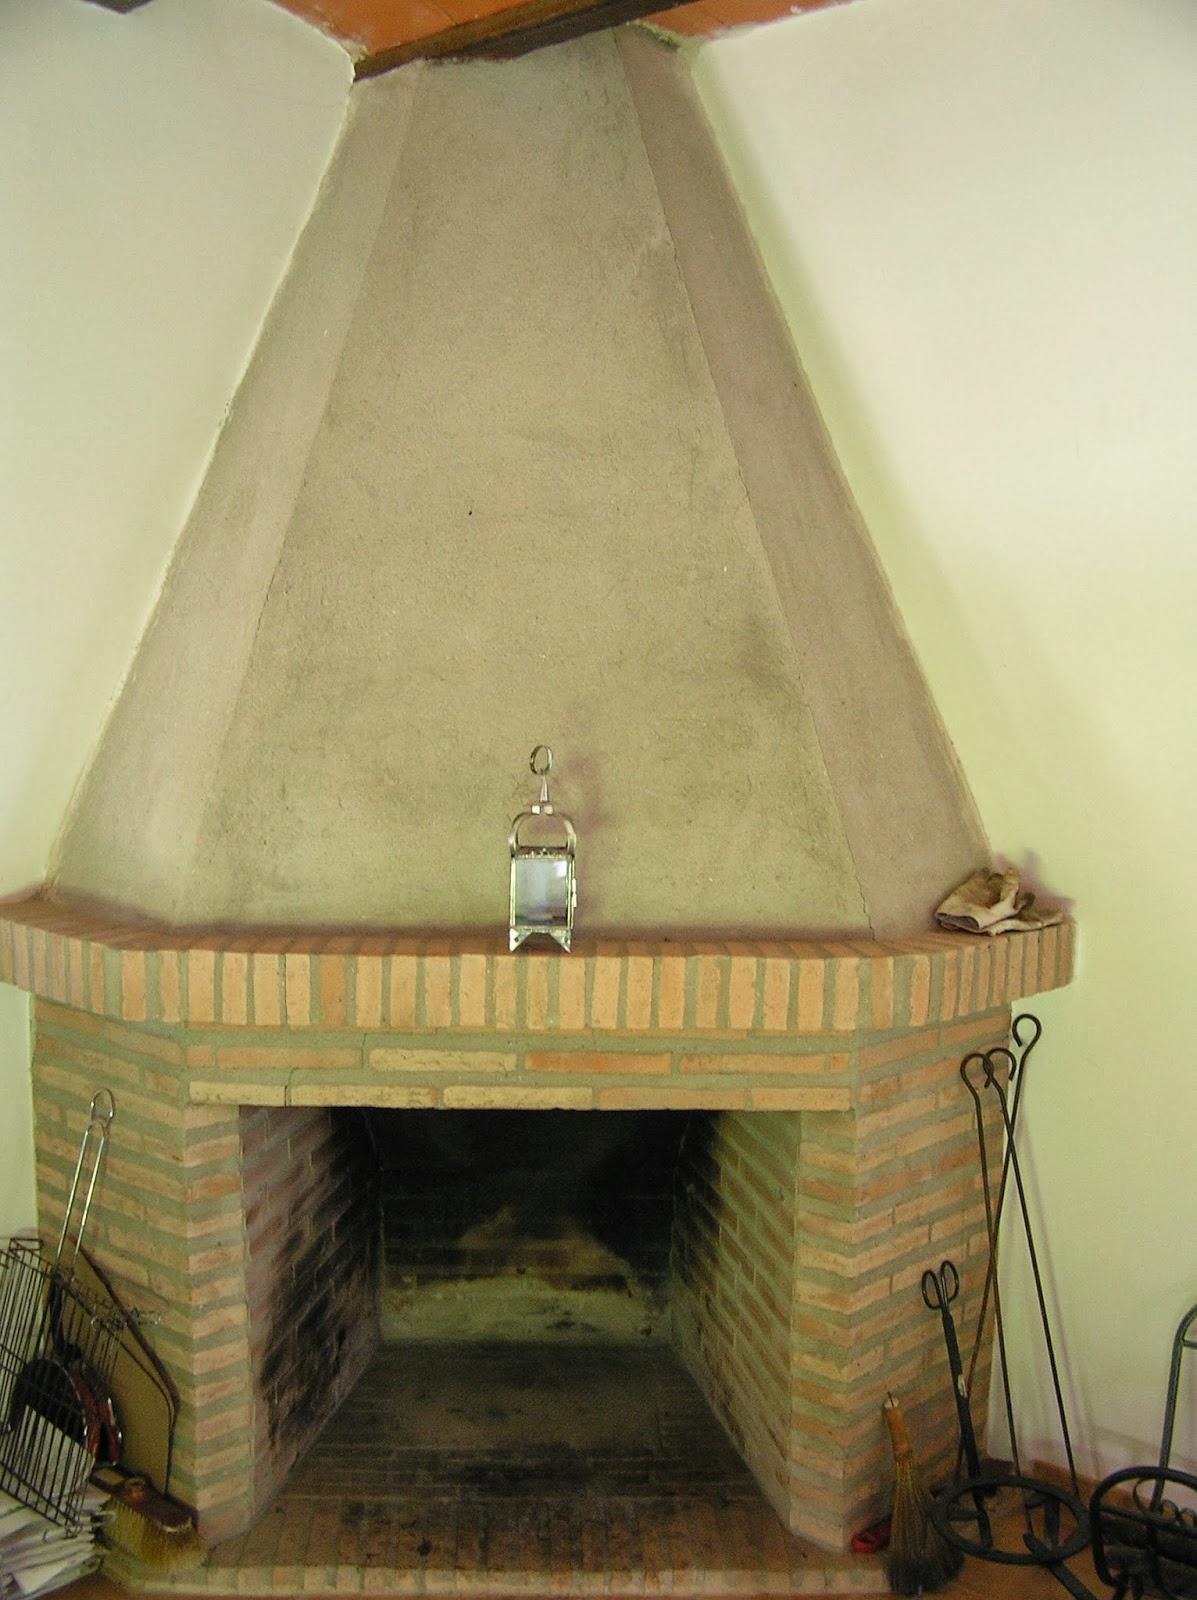 El huerto es facil medidas chimenea u hogar parte i - Chimeneas a medida ...